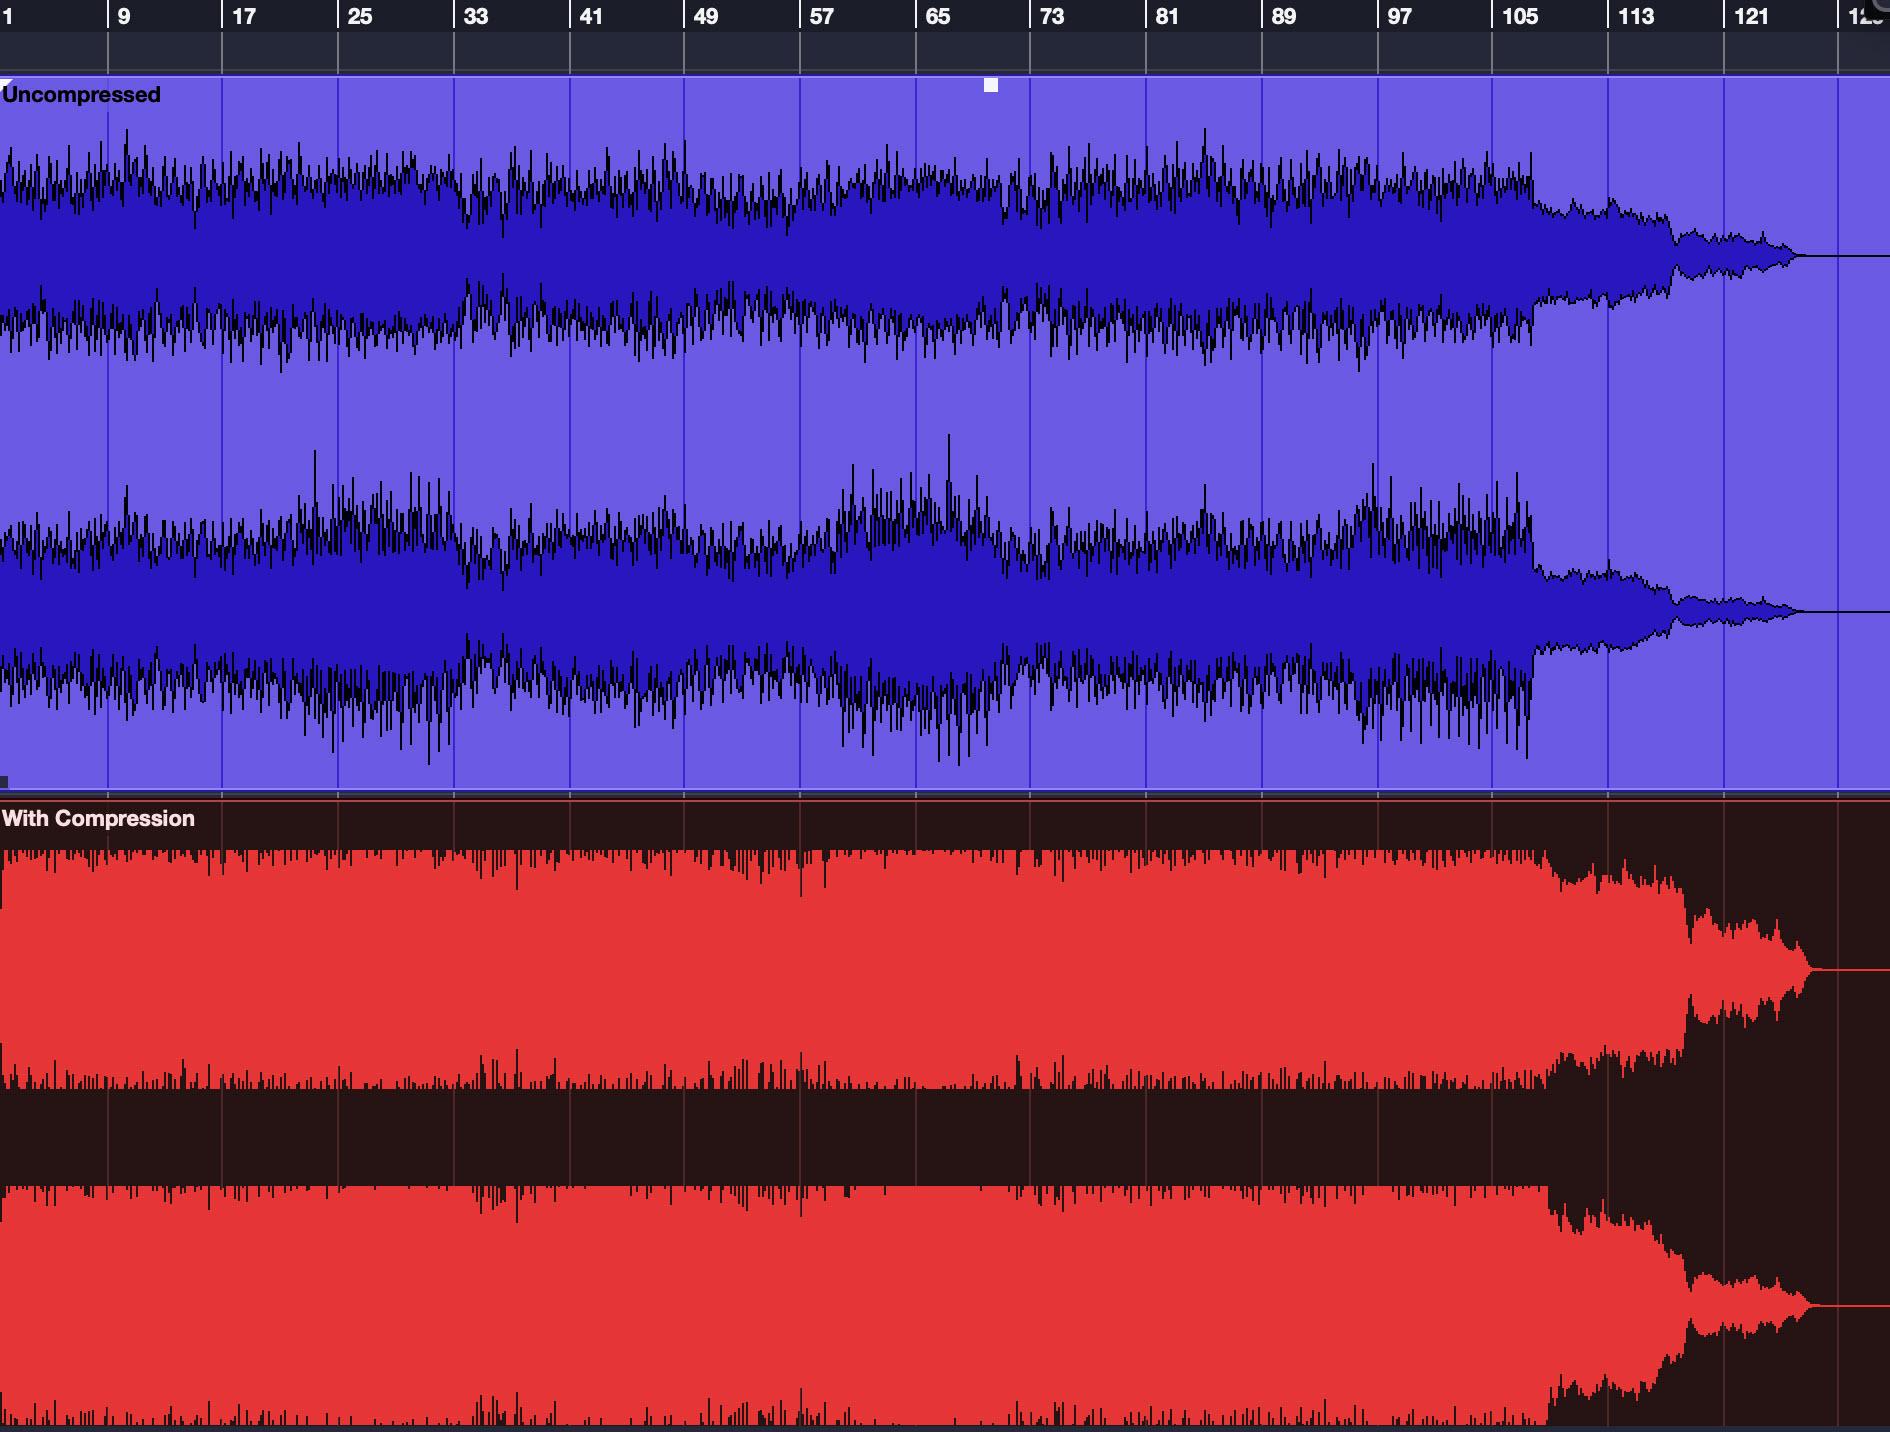 Screenshot of soundwaves on screen.